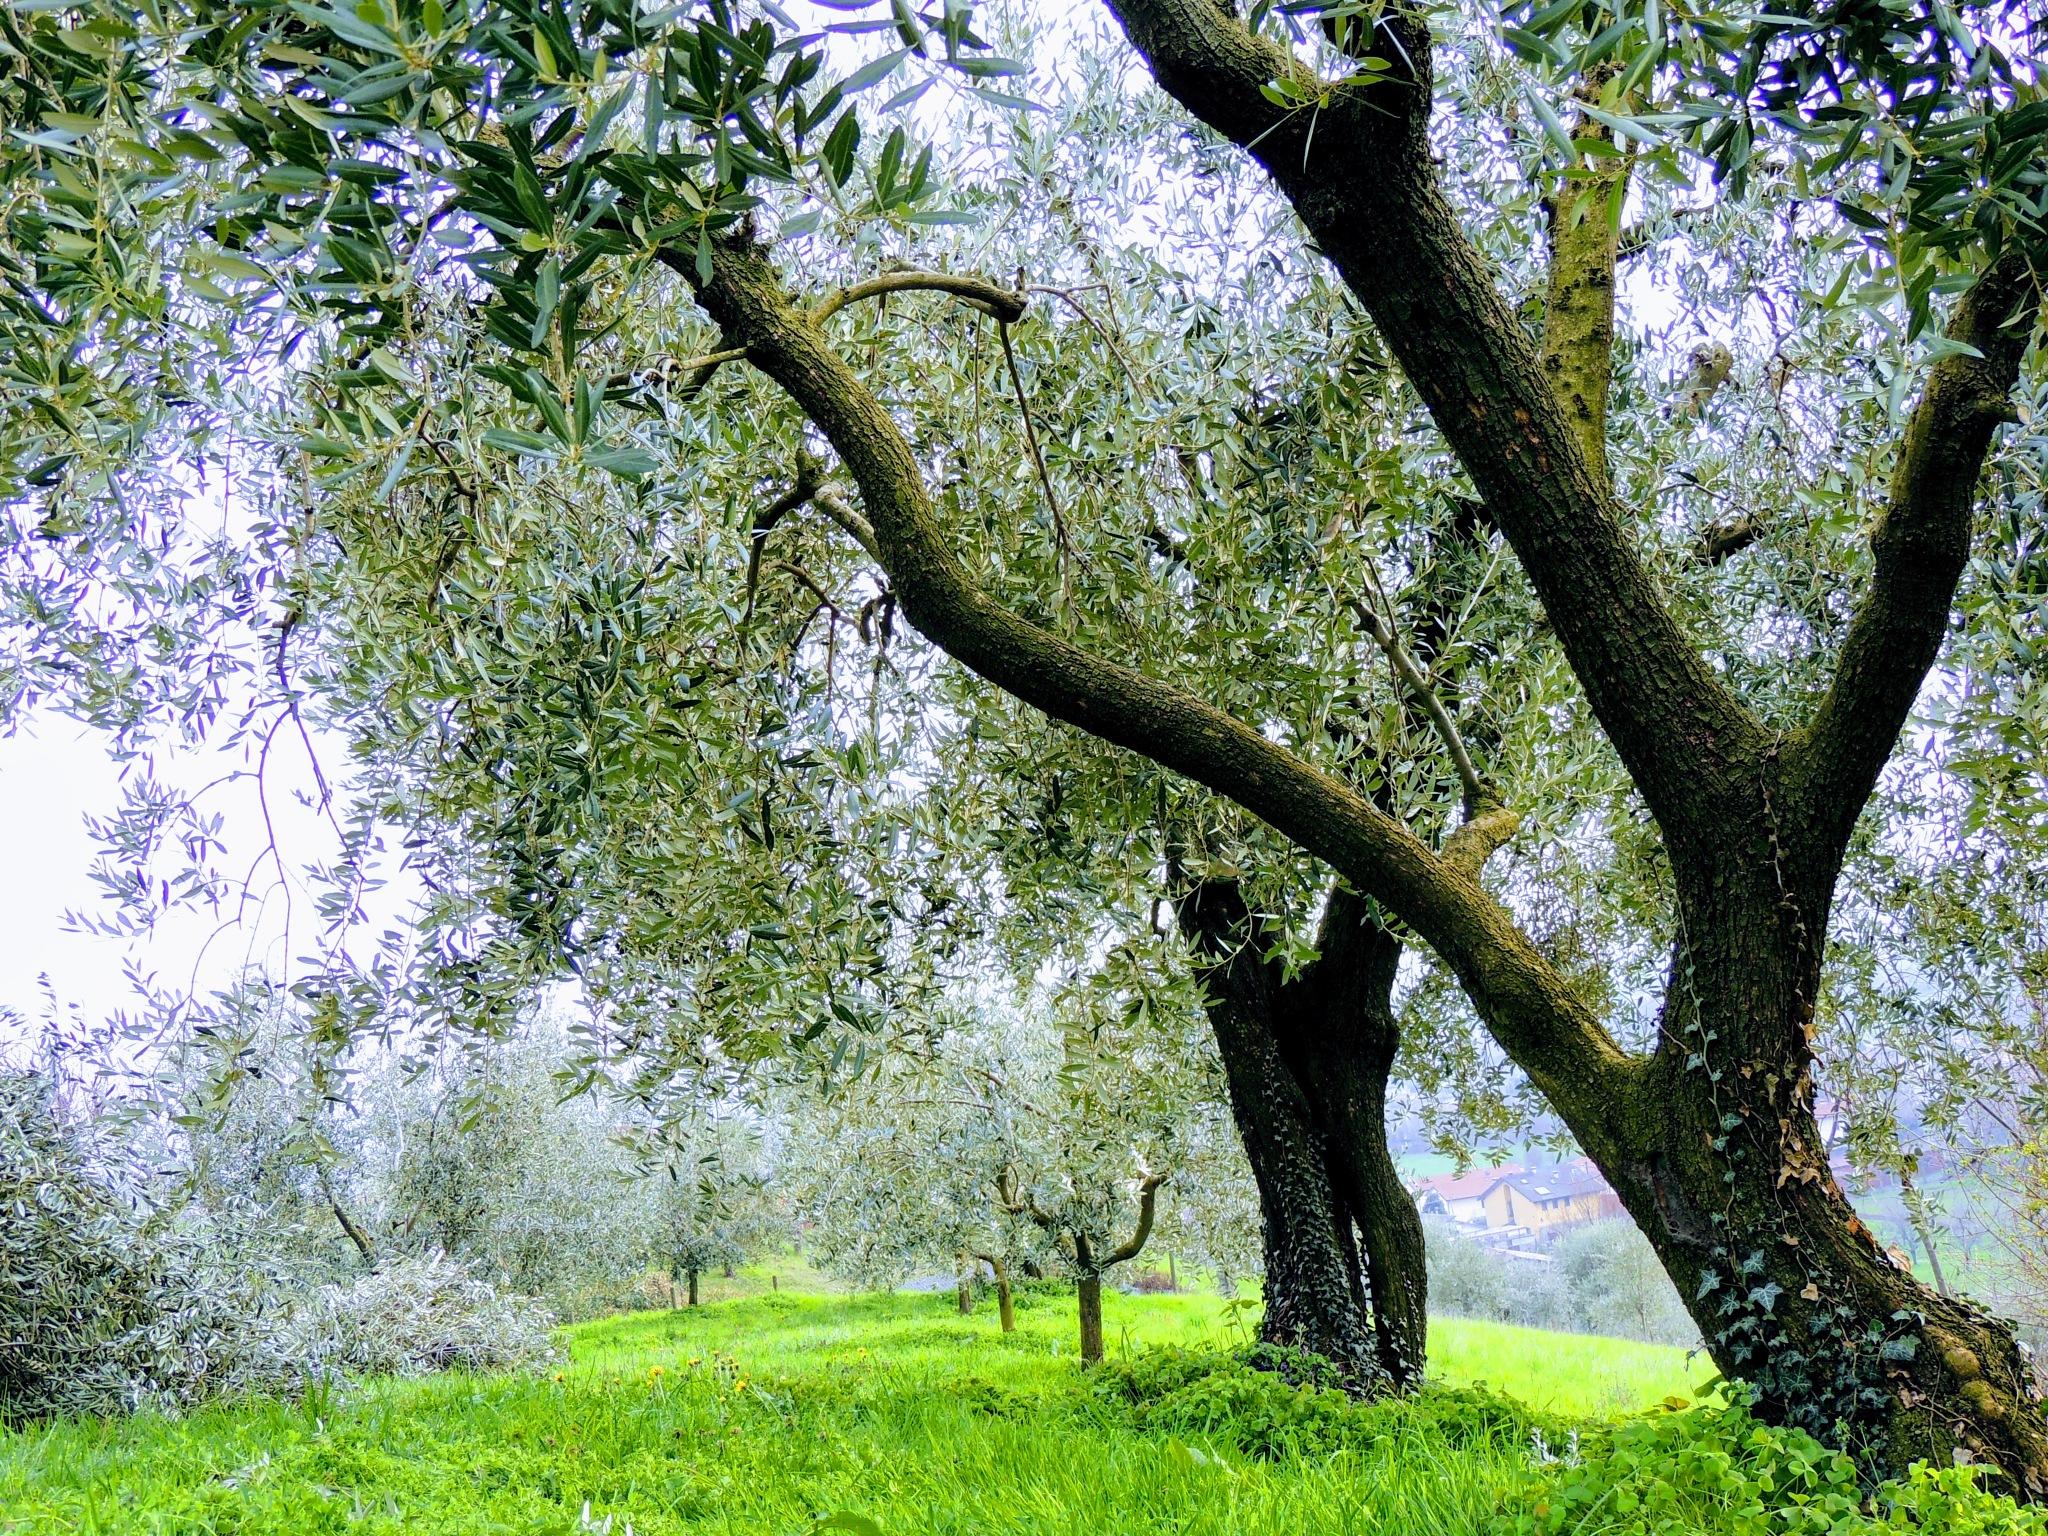 Olives by Damiano Mozzato